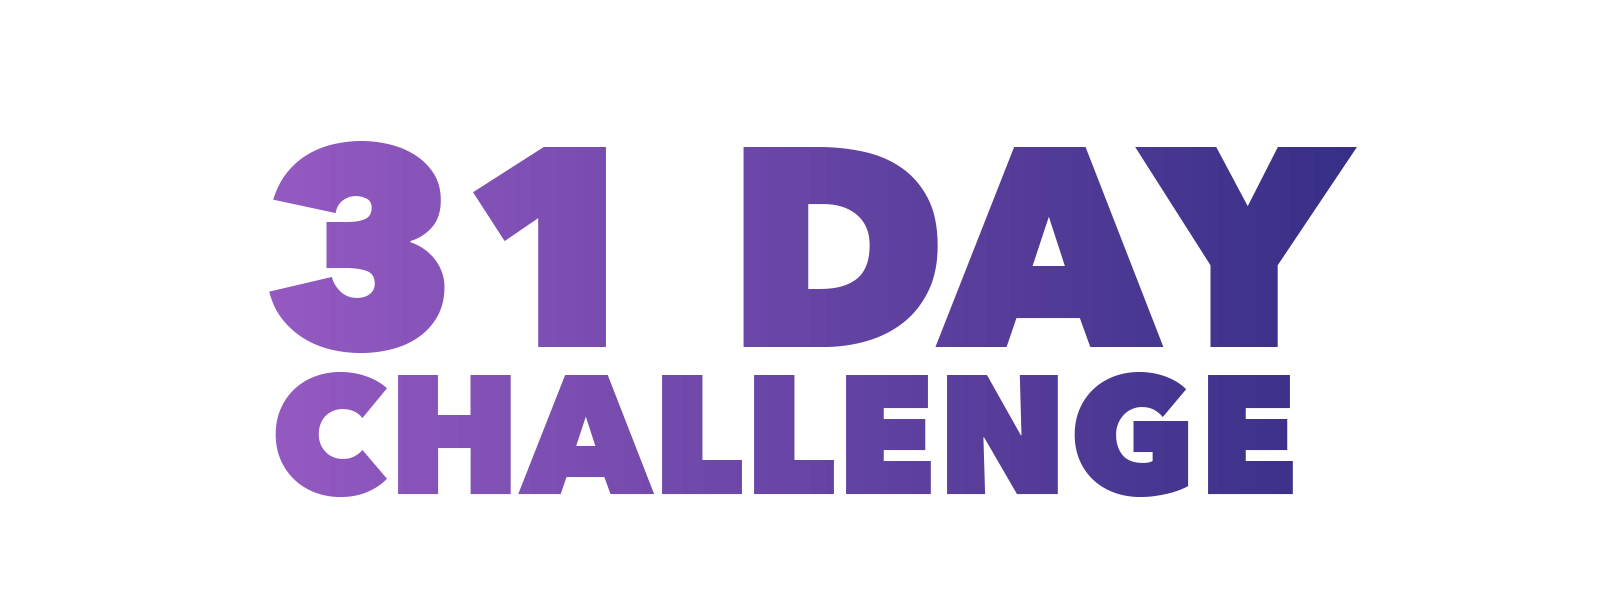 DVAM 31 Day Challenge